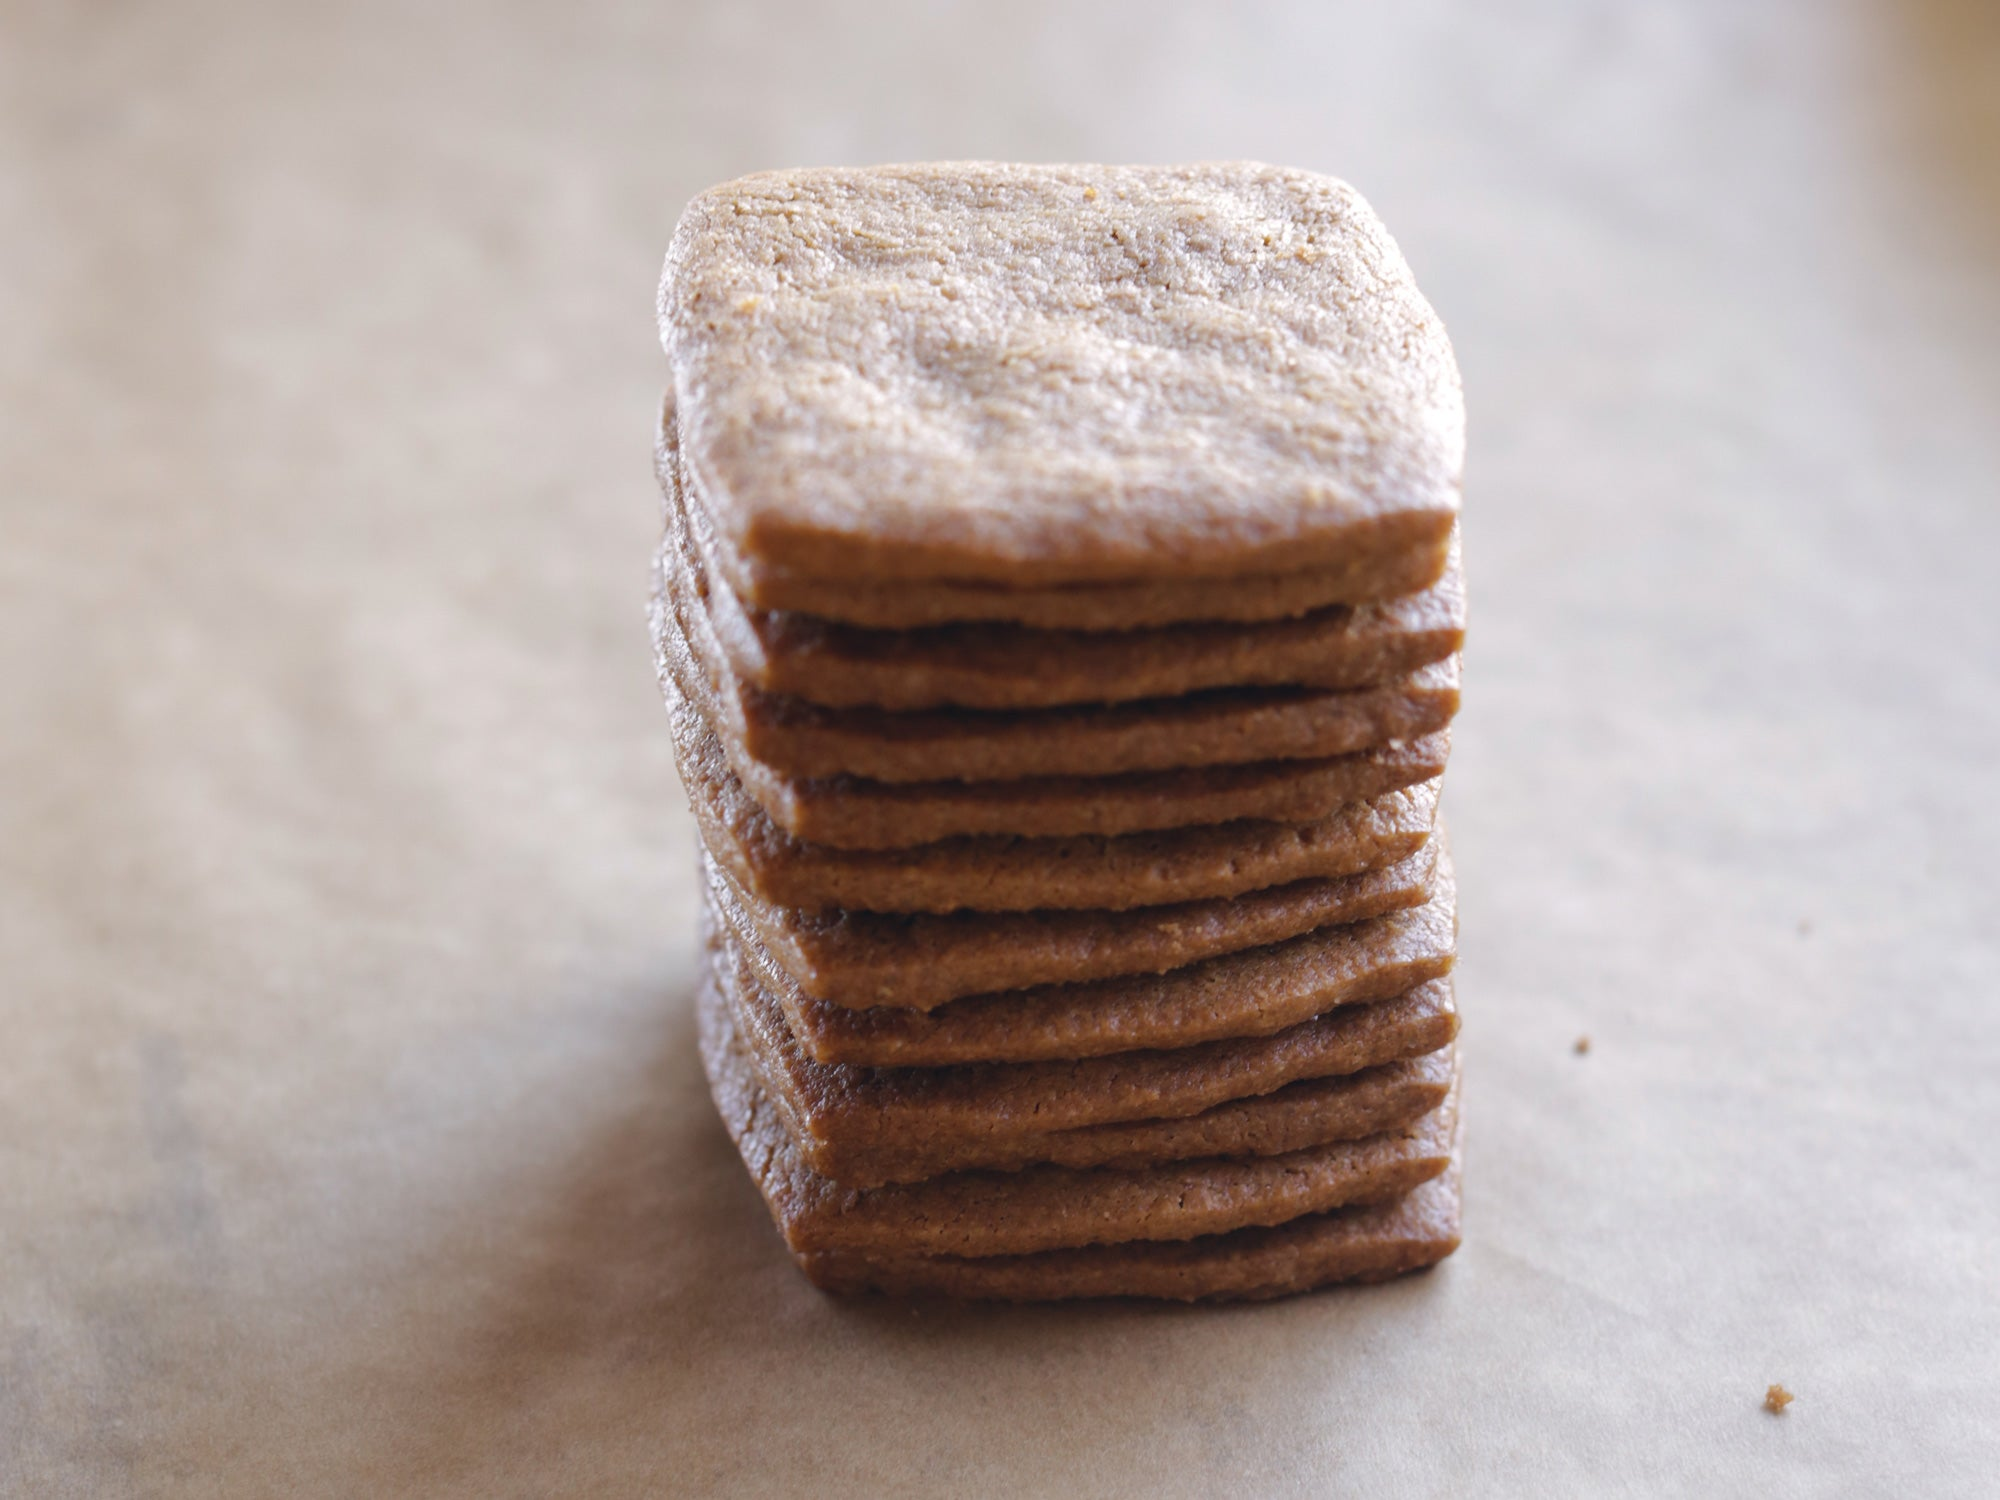 Breadfarm's Graham Crackers